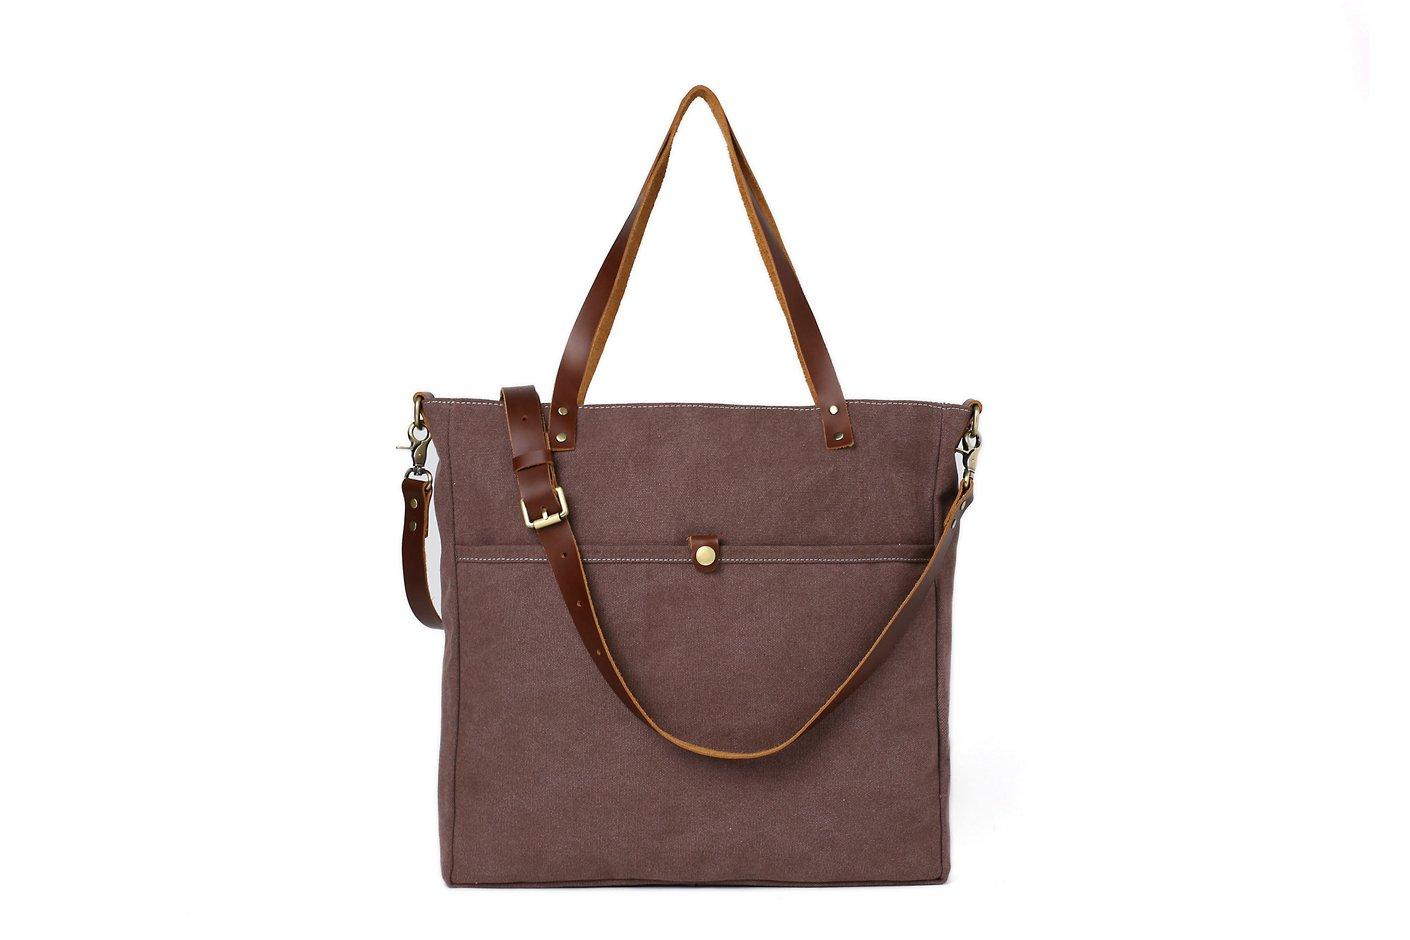 39fc99b781 Handmade Canvas Tote Bag Messenger Bag School Bag Handbag Shoulder Bag 16000